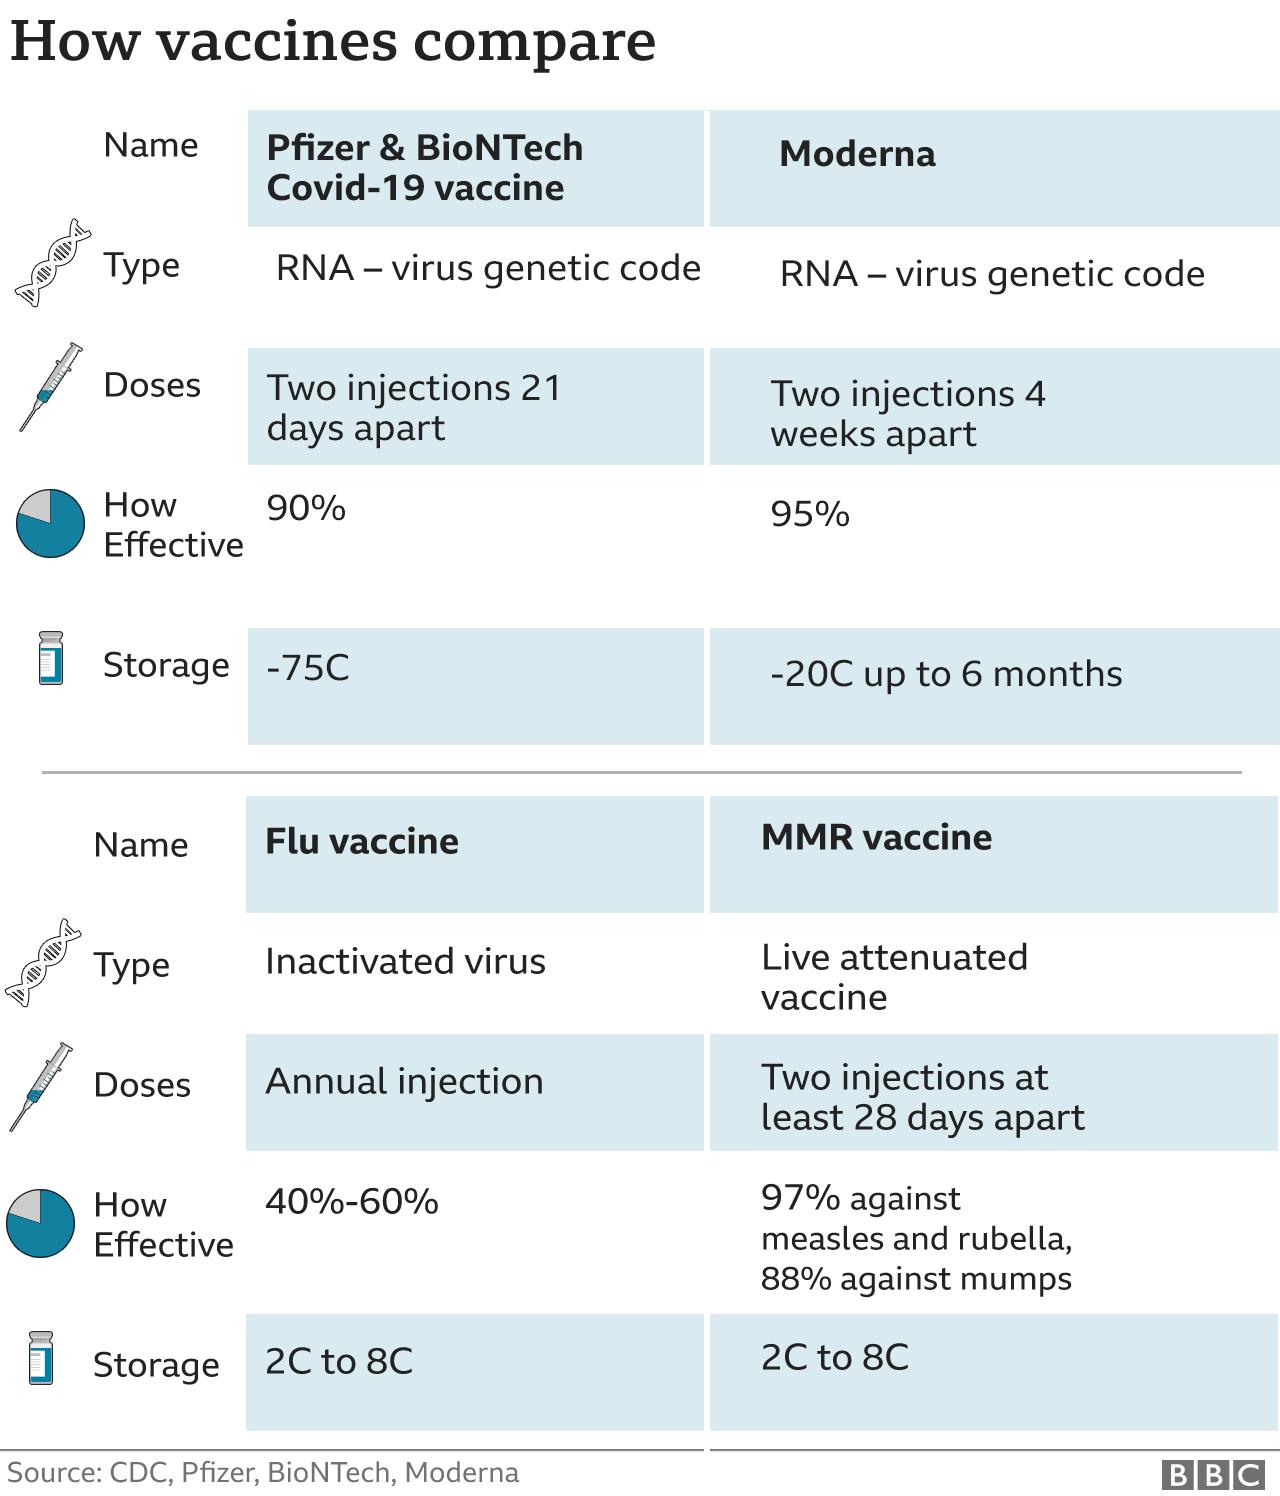 Pfizer vs Moderna COVID-19 vaccines